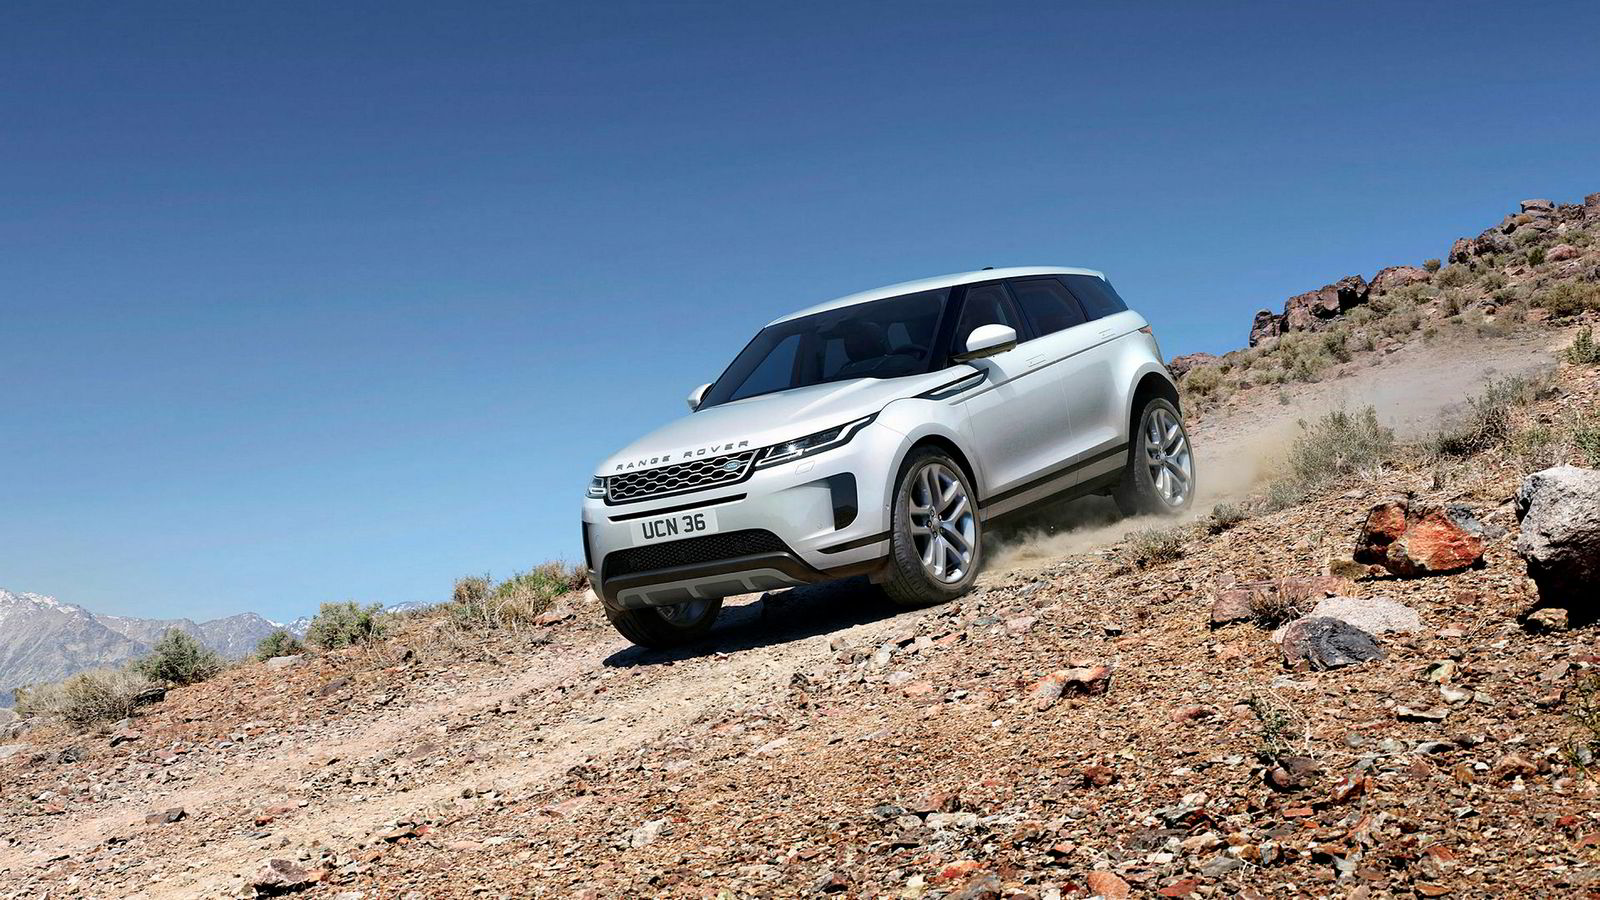 Nye Range Rover Evoque er til forveksling lik Range Rover Evoque.